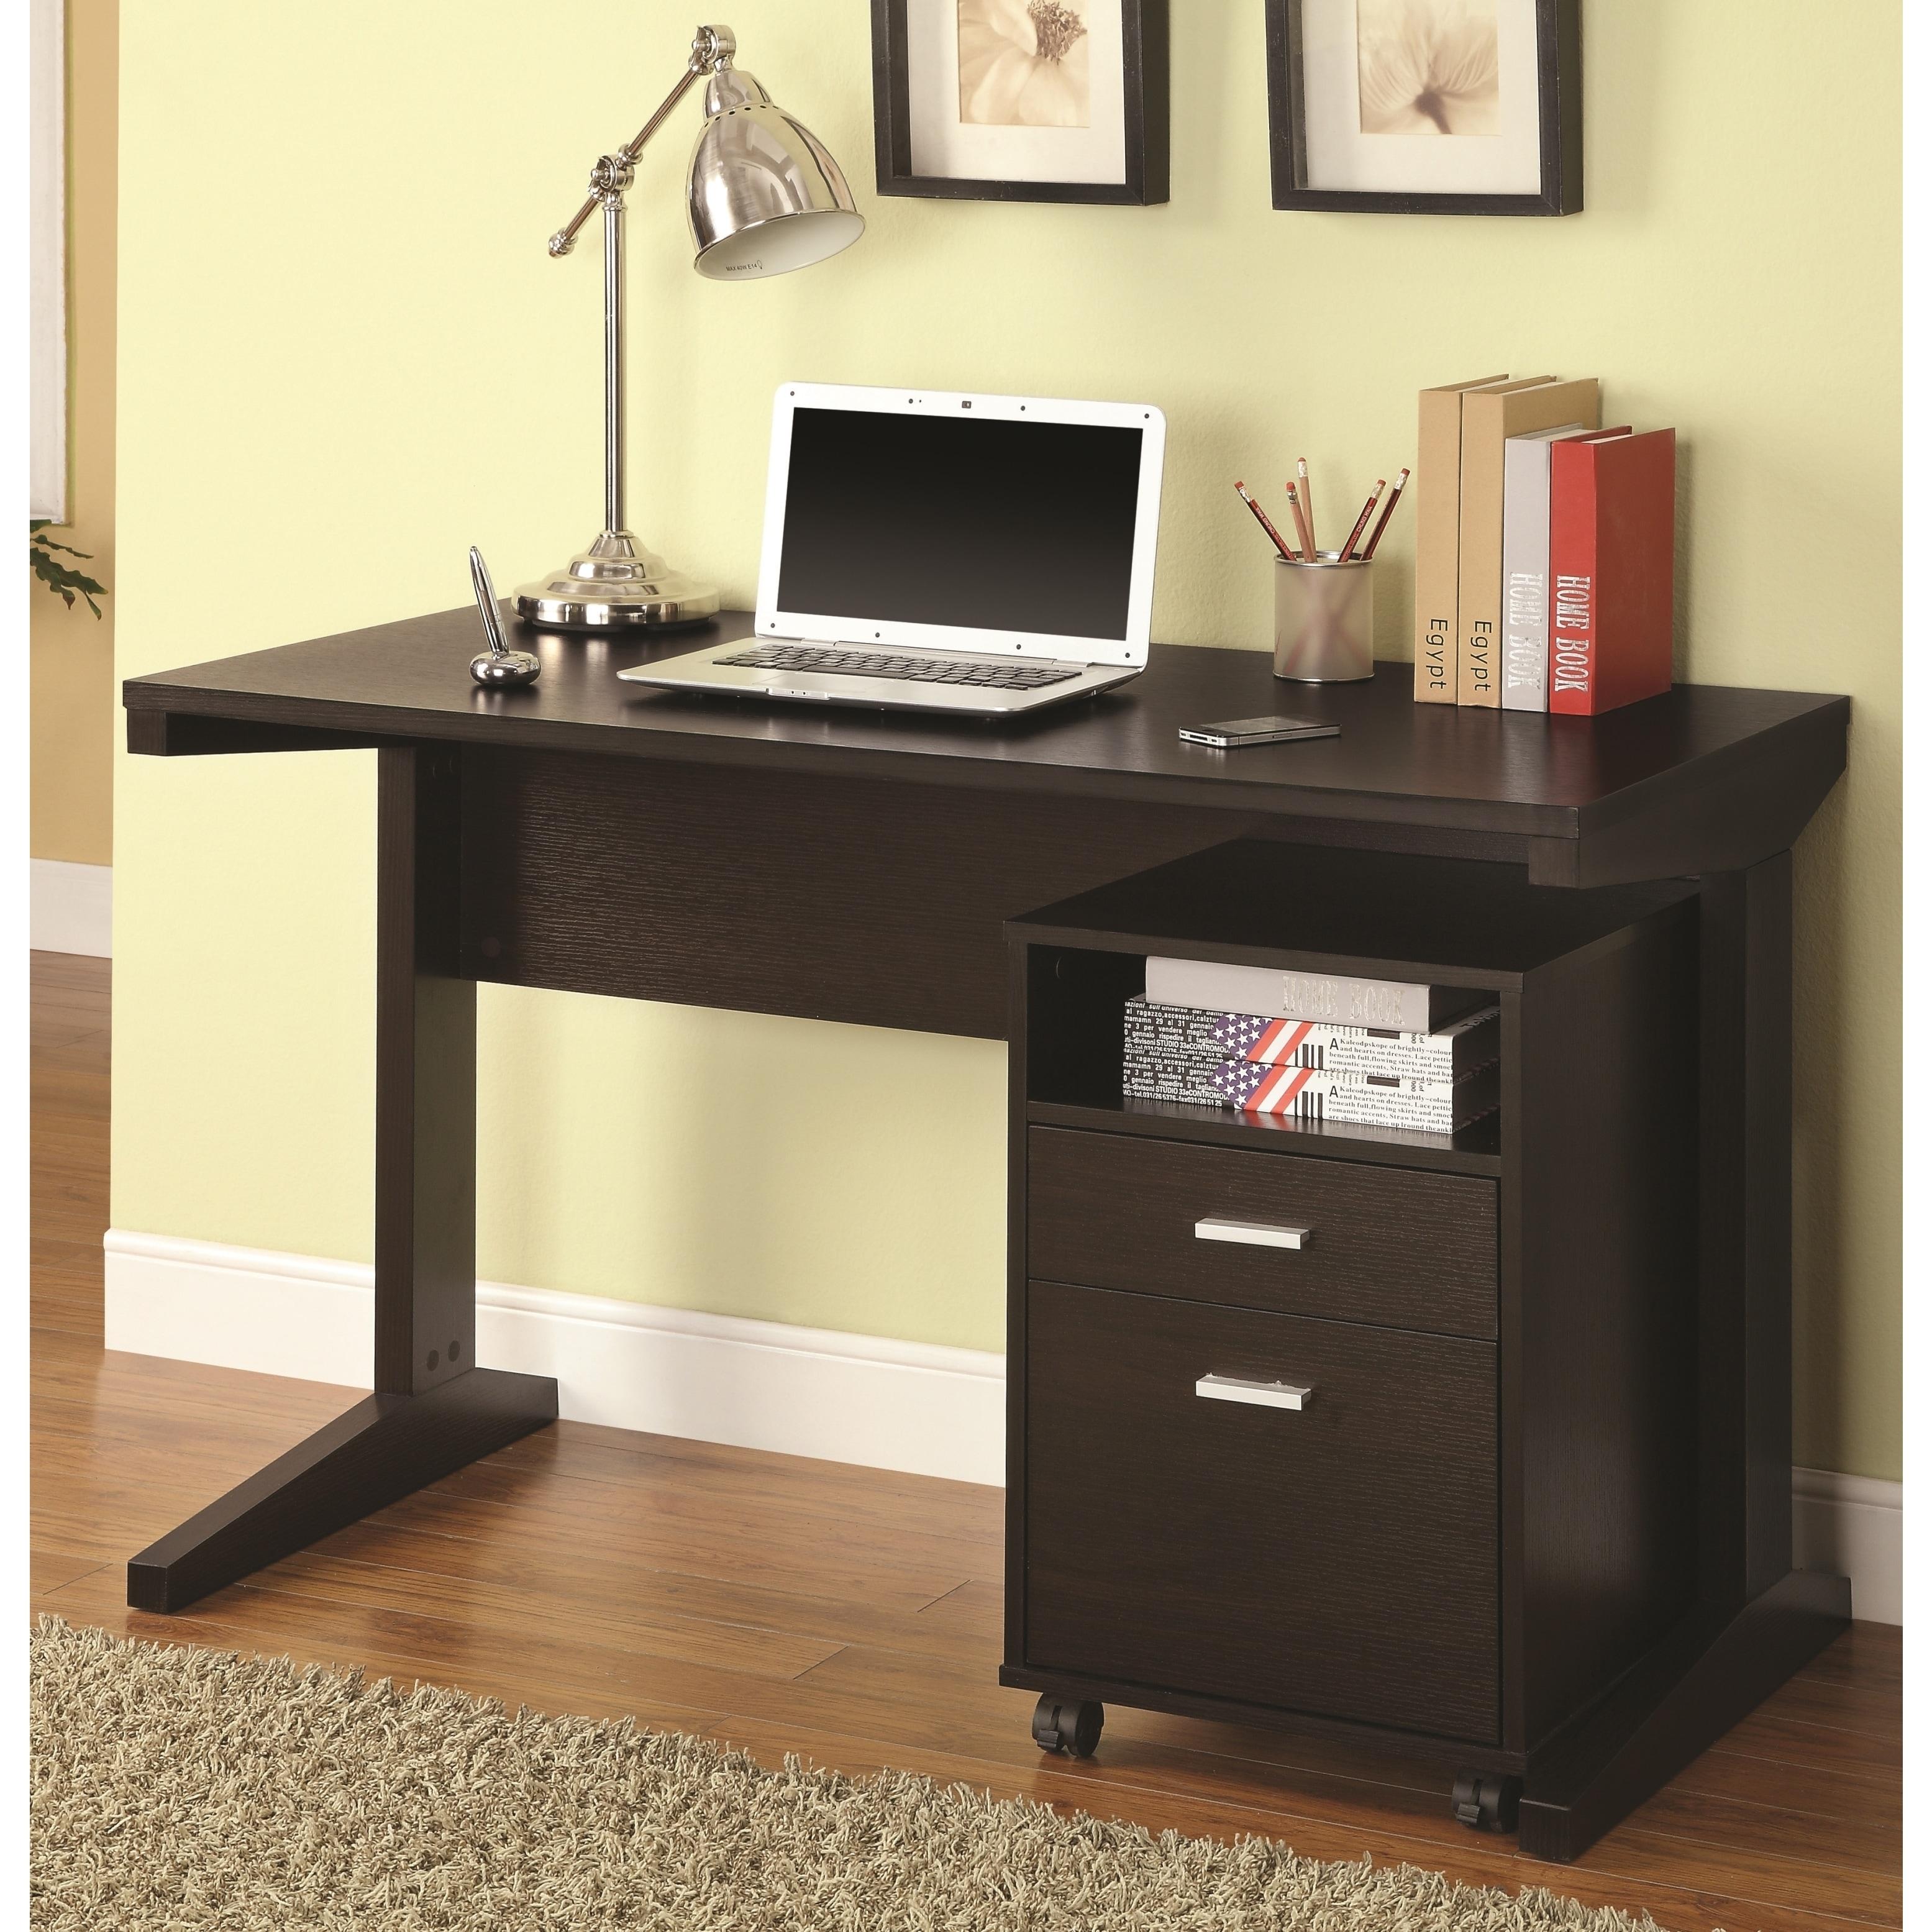 Shop Mid Century Modern Design Home Office Desk With Mobile File